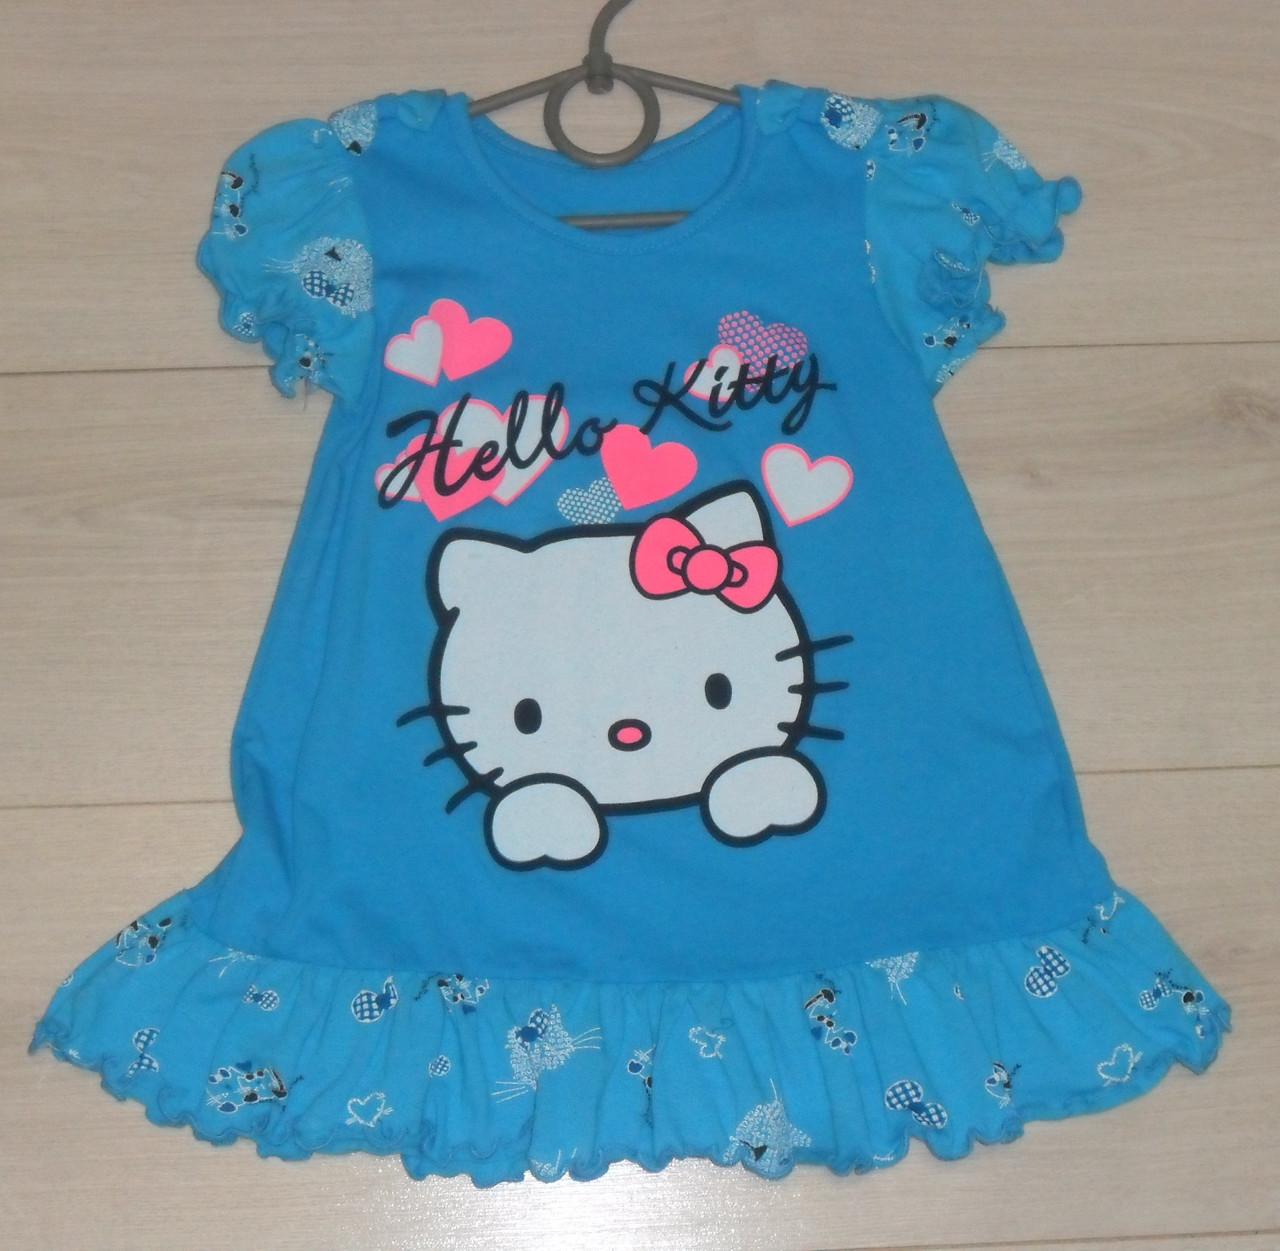 2627241fd32 Летнее платье для девочки Хэллоу Китти